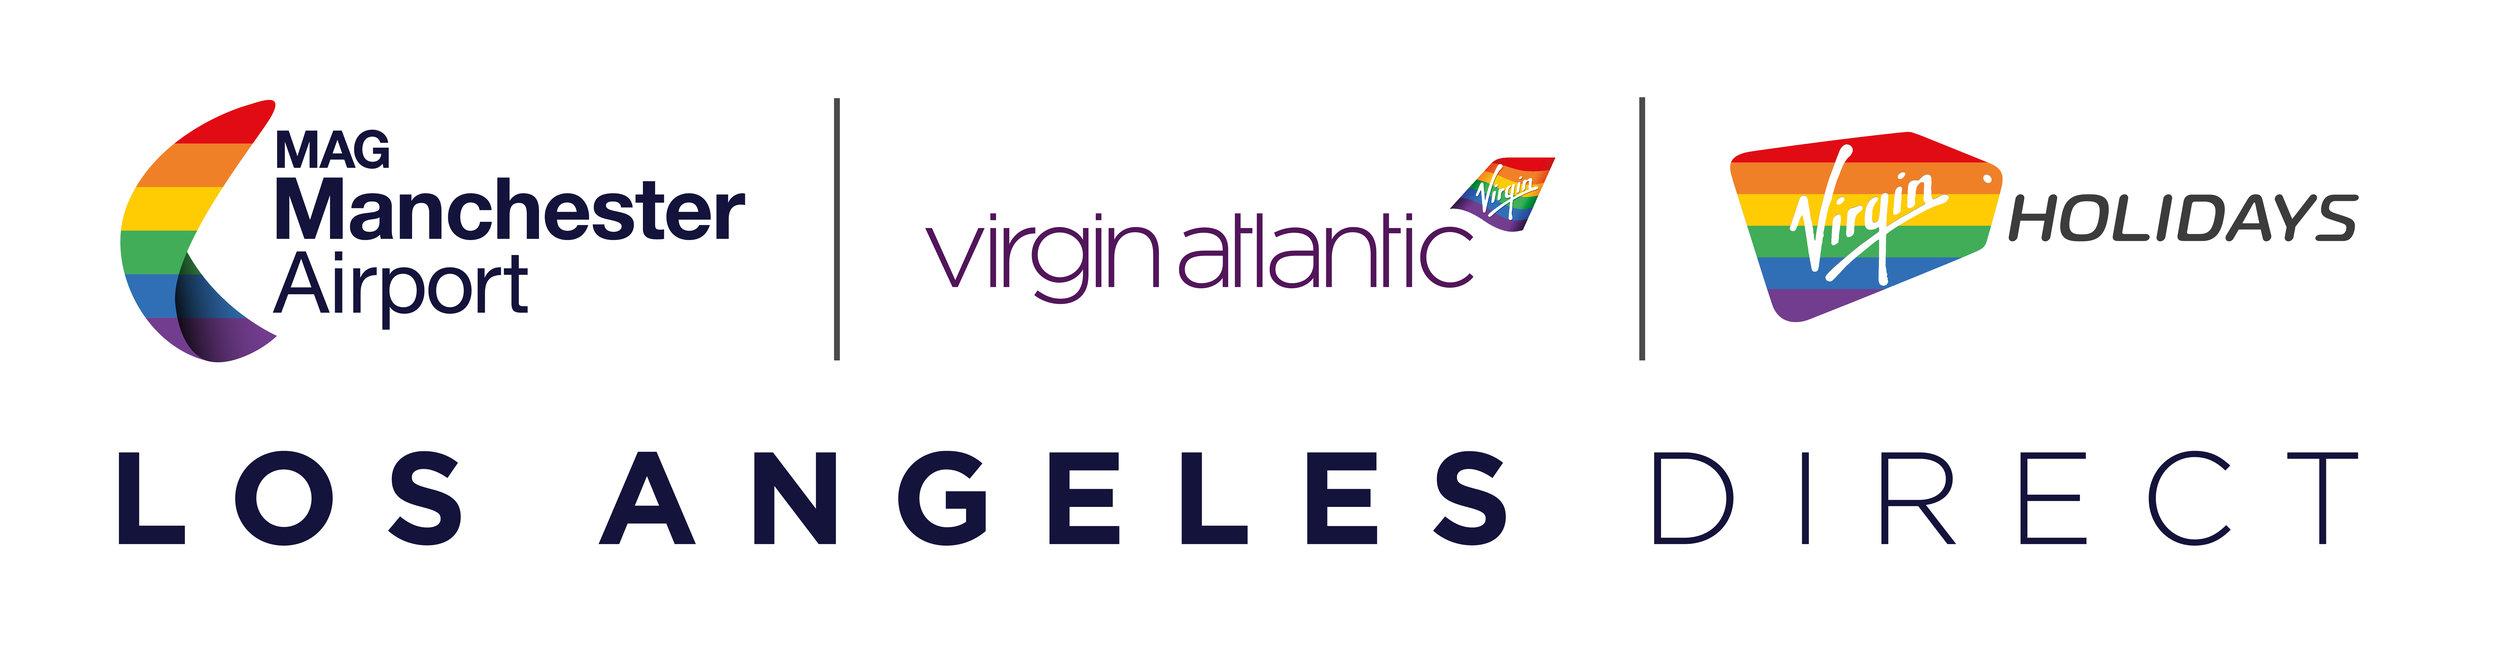 LADirect-LGBT-LogoLockup-01 copy.jpg